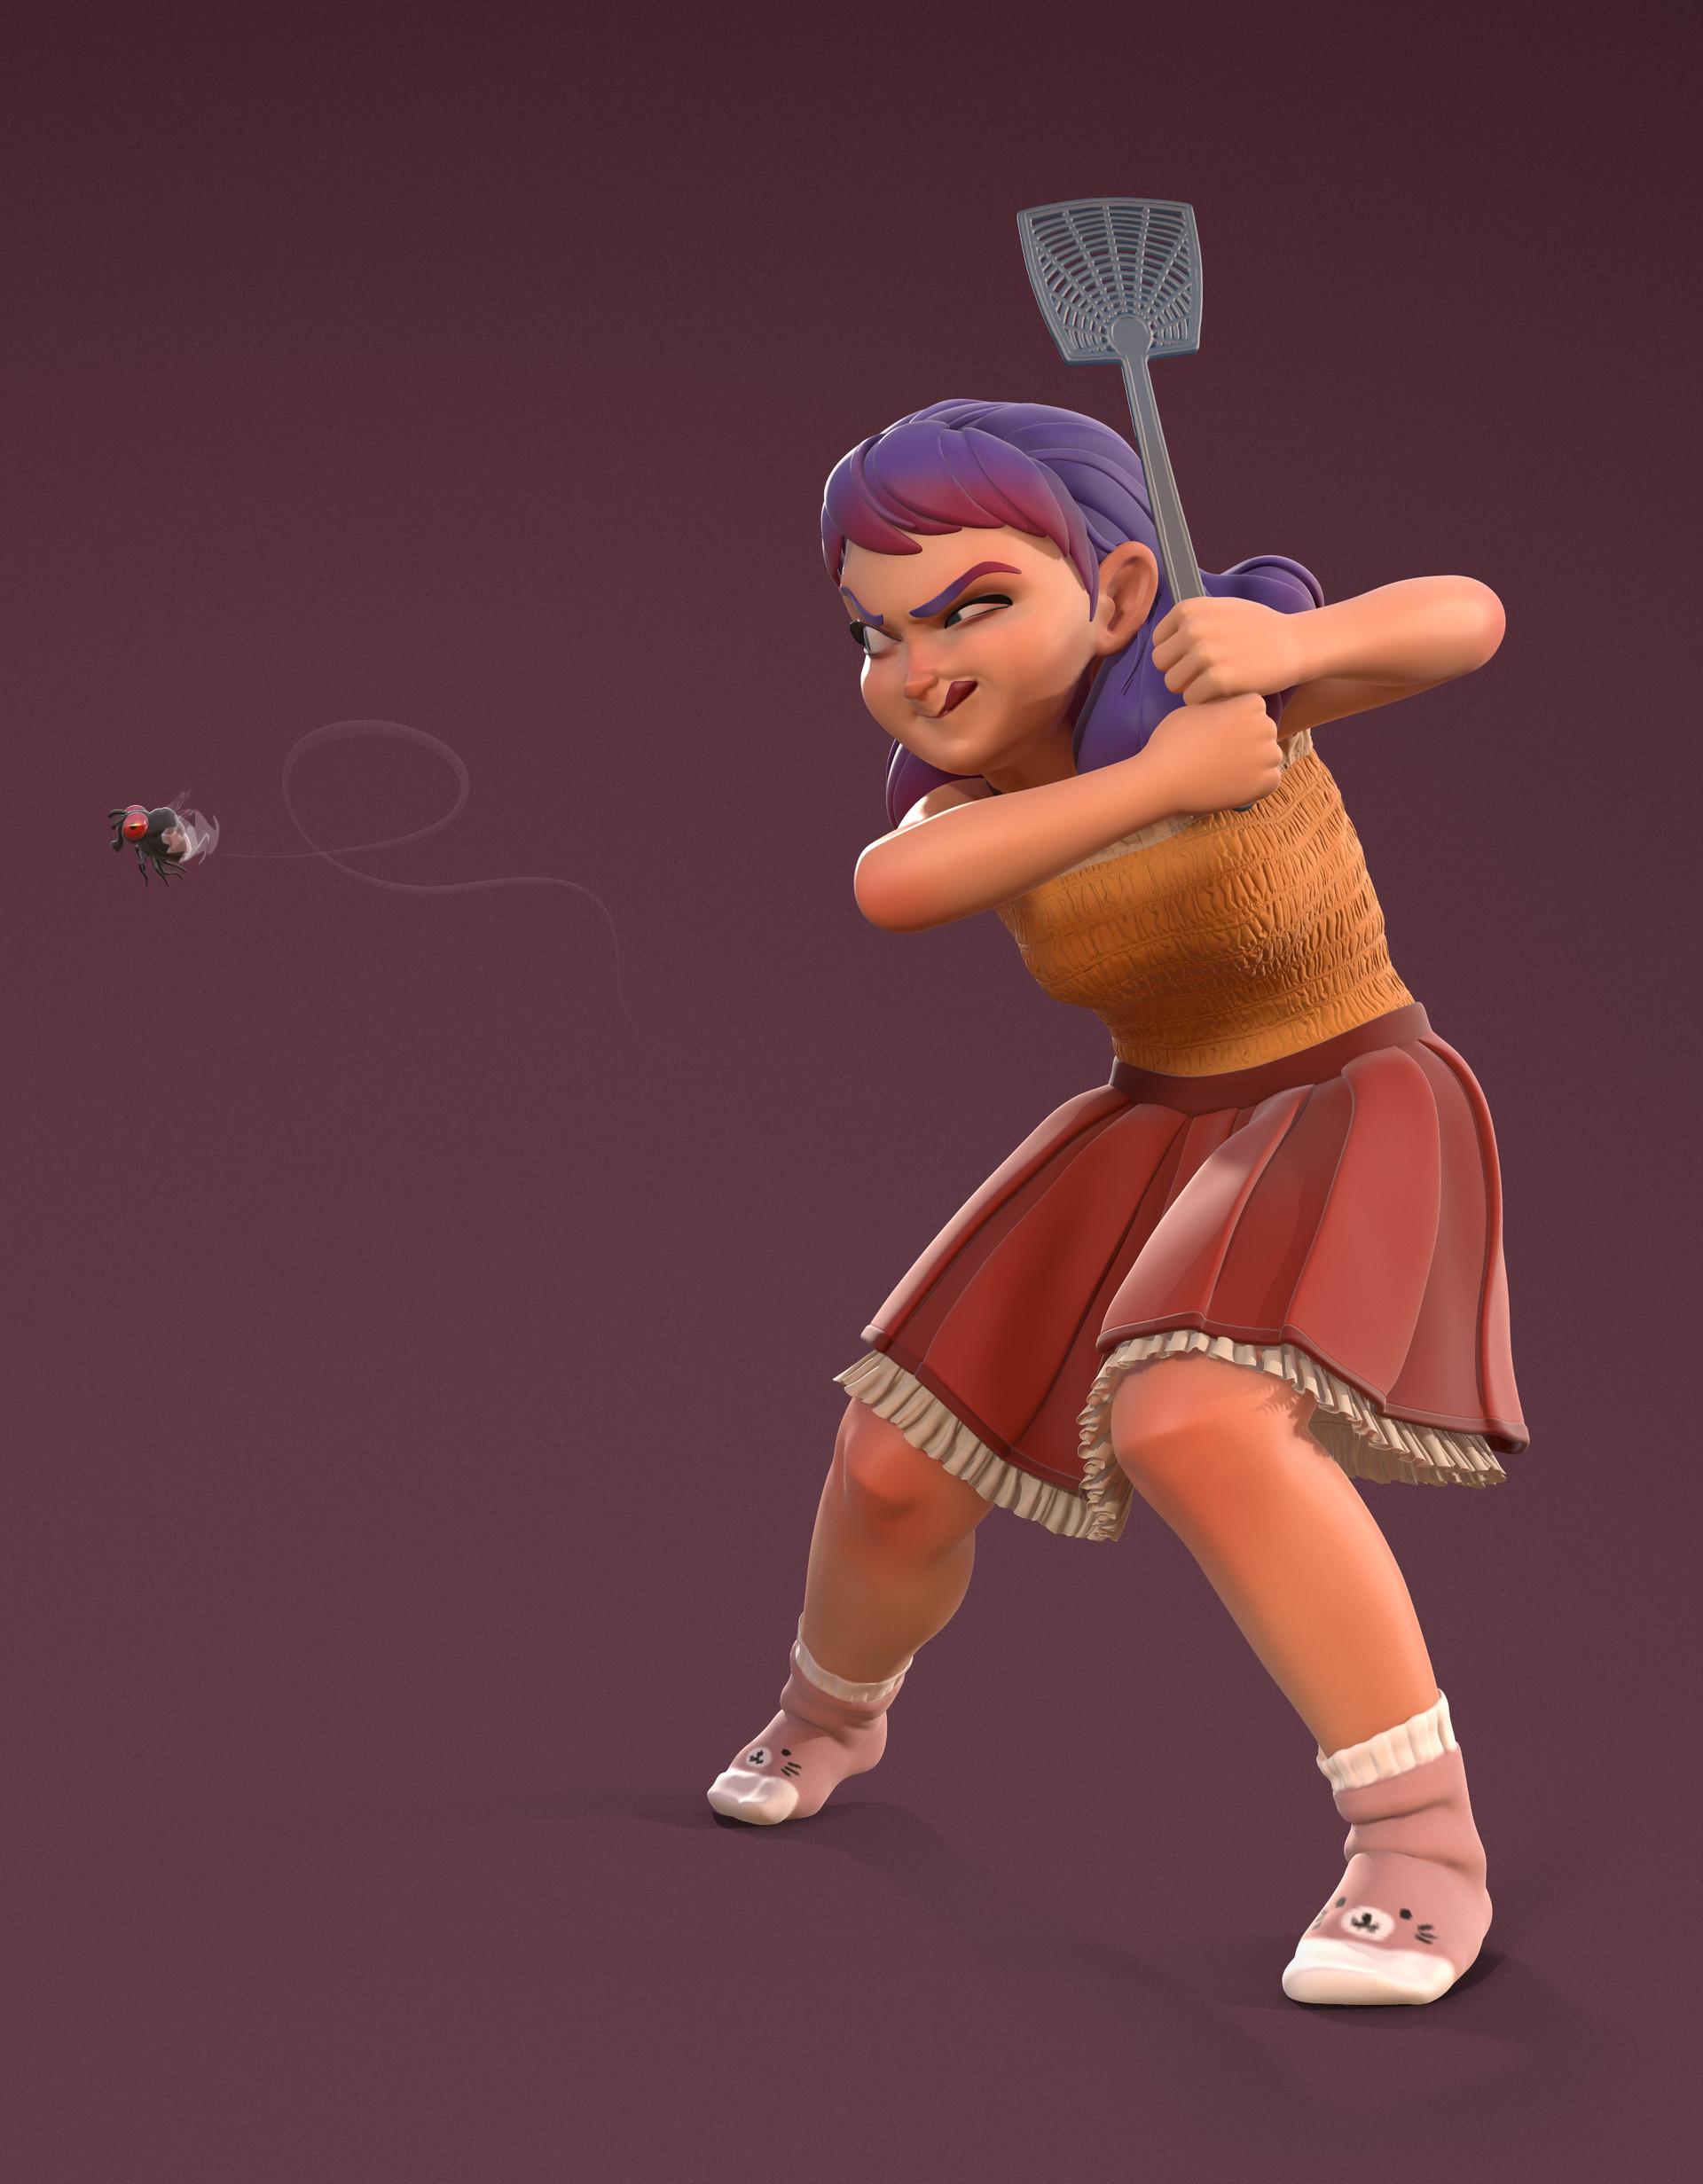 Alexandre proulx audy fly girl marmoset 02